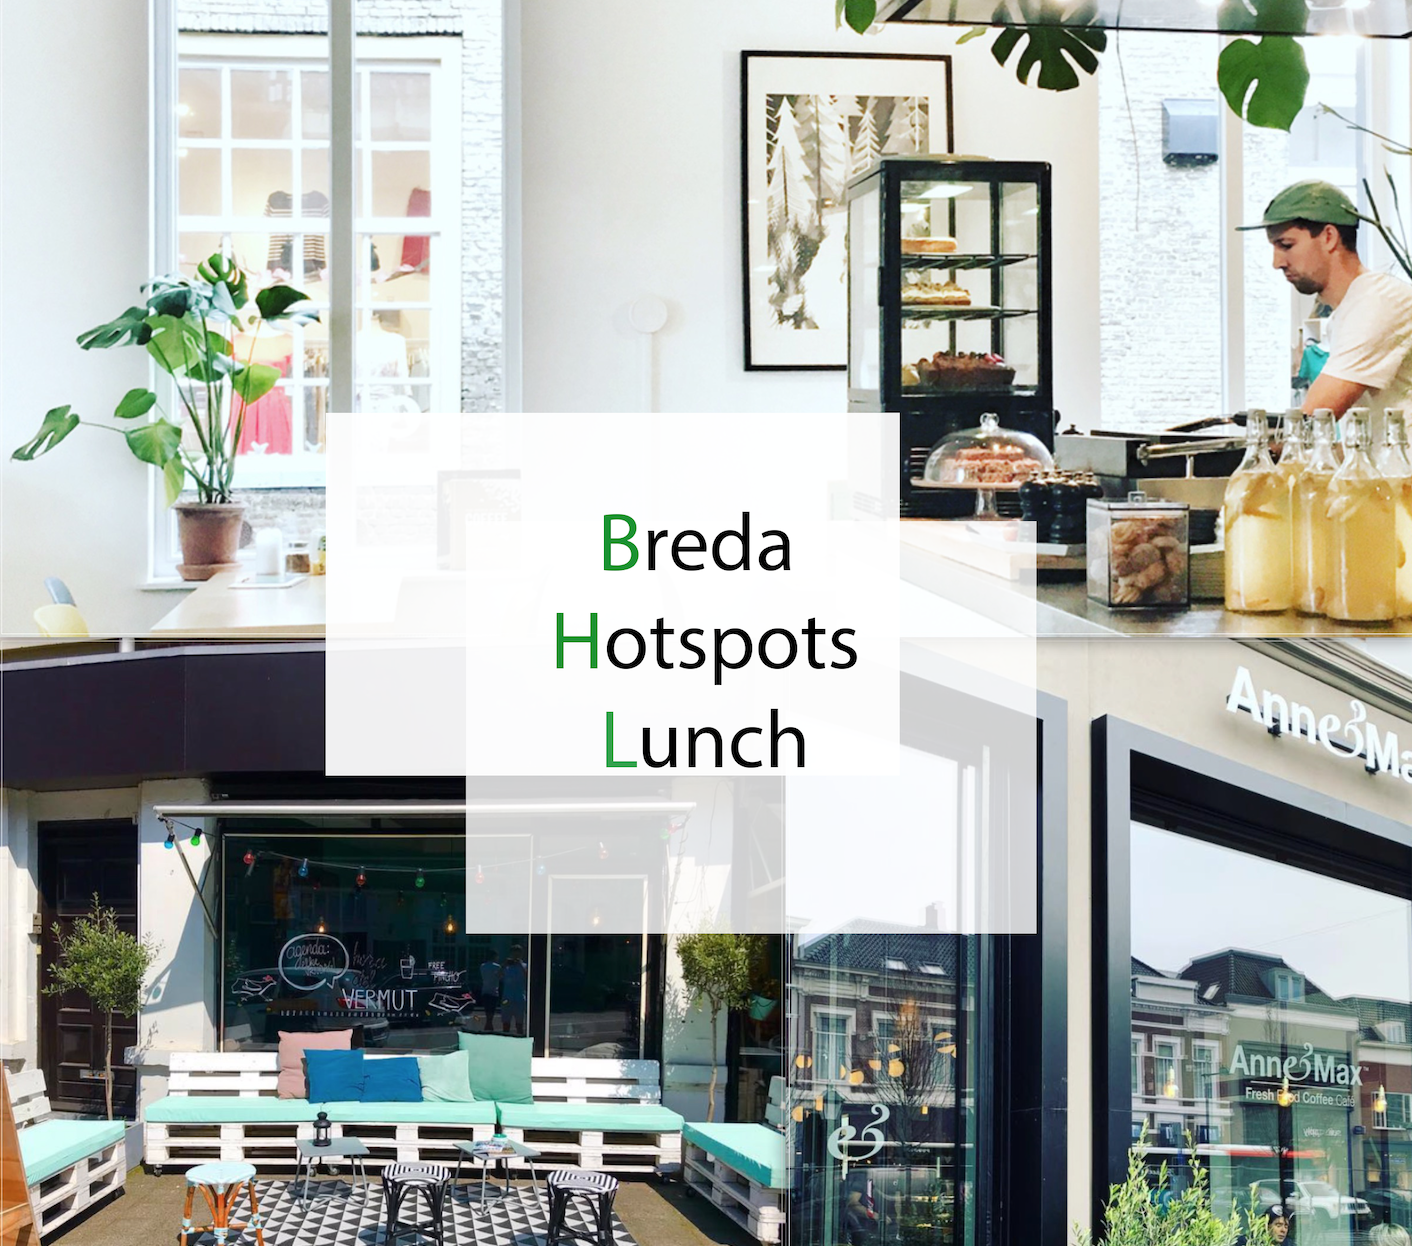 Hotspots lunch Breda